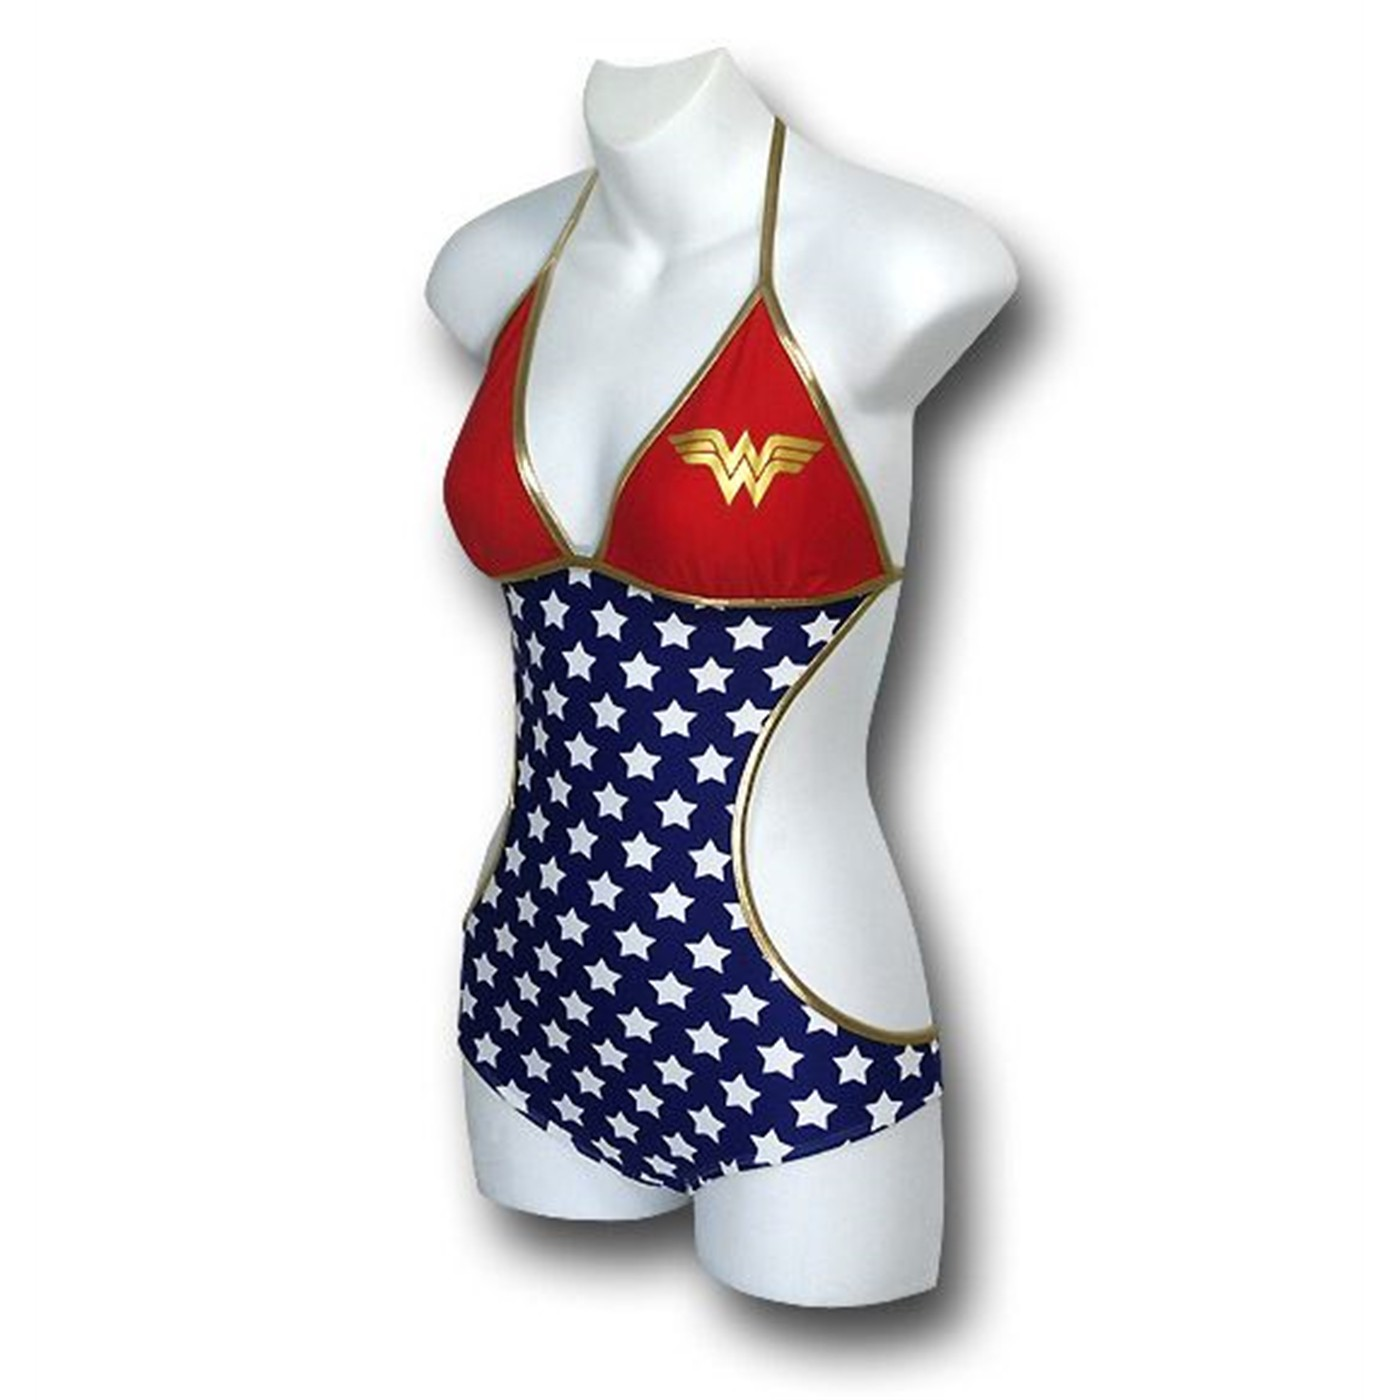 Wonder Woman Triangle Monokini Women's Swimsuit